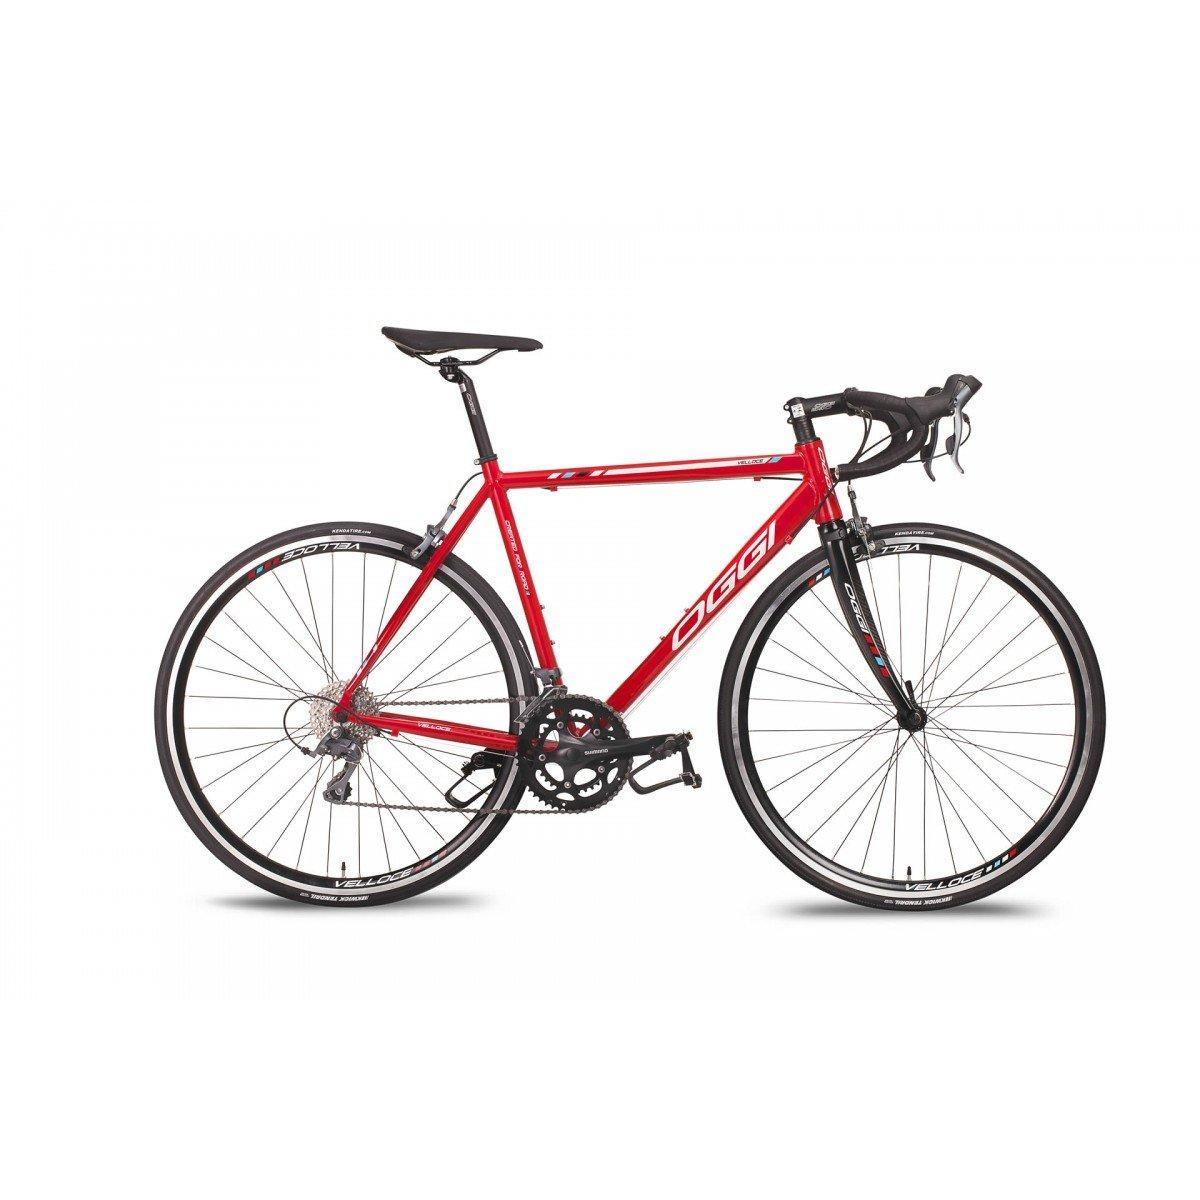 Oggi Velloce bicicleta speed barata